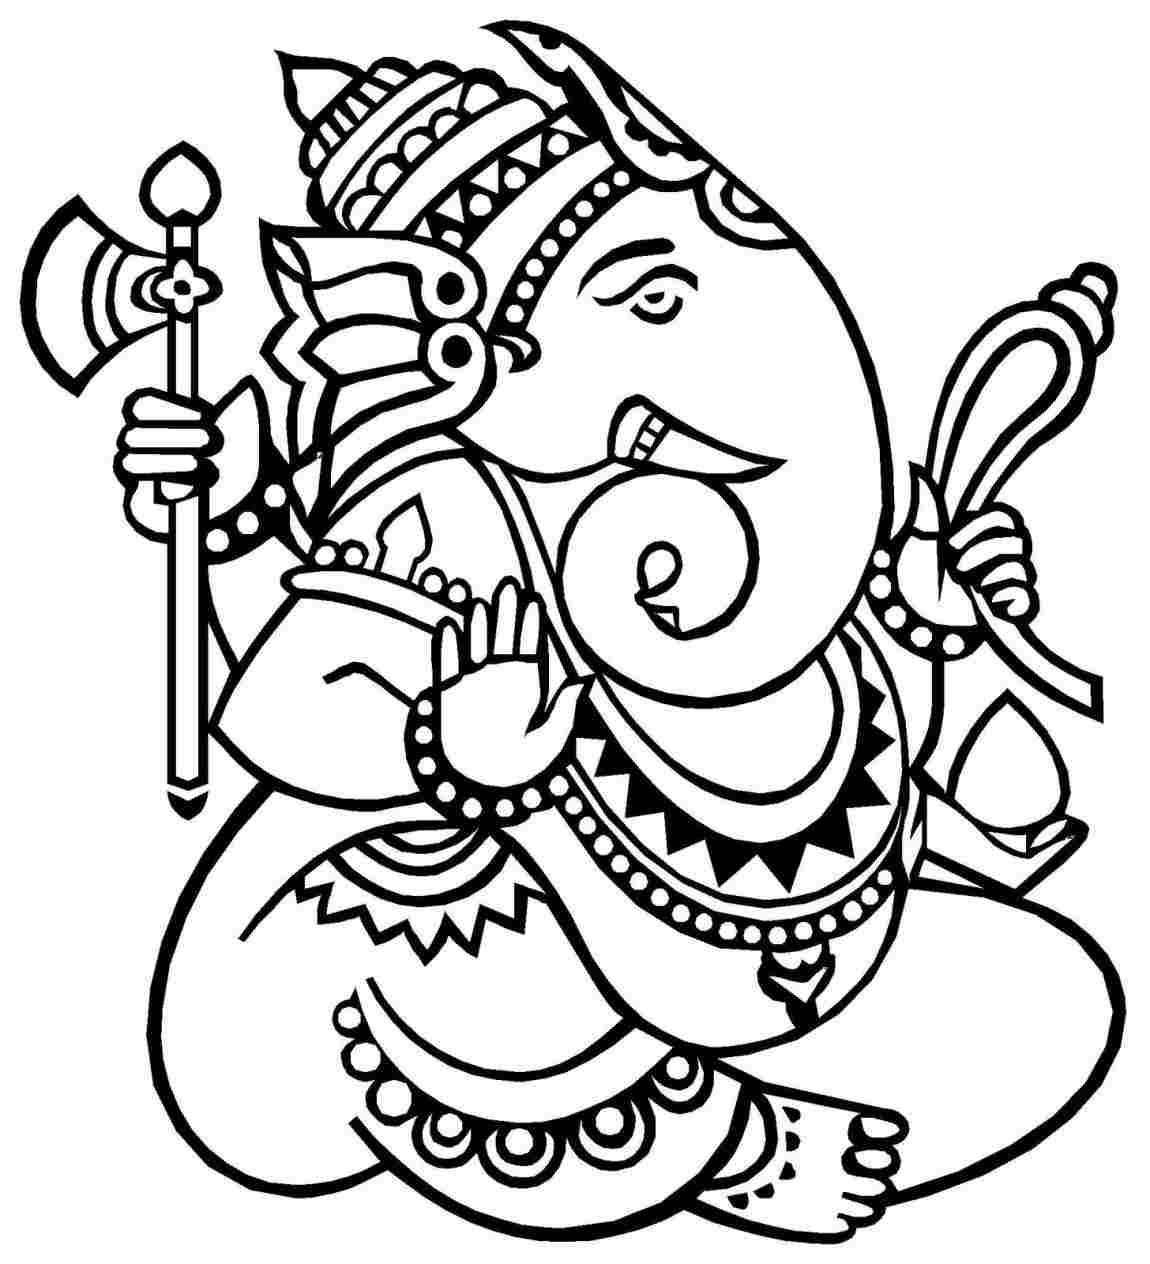 Ganesh pencil drawing free download best ganesh pencil drawing on